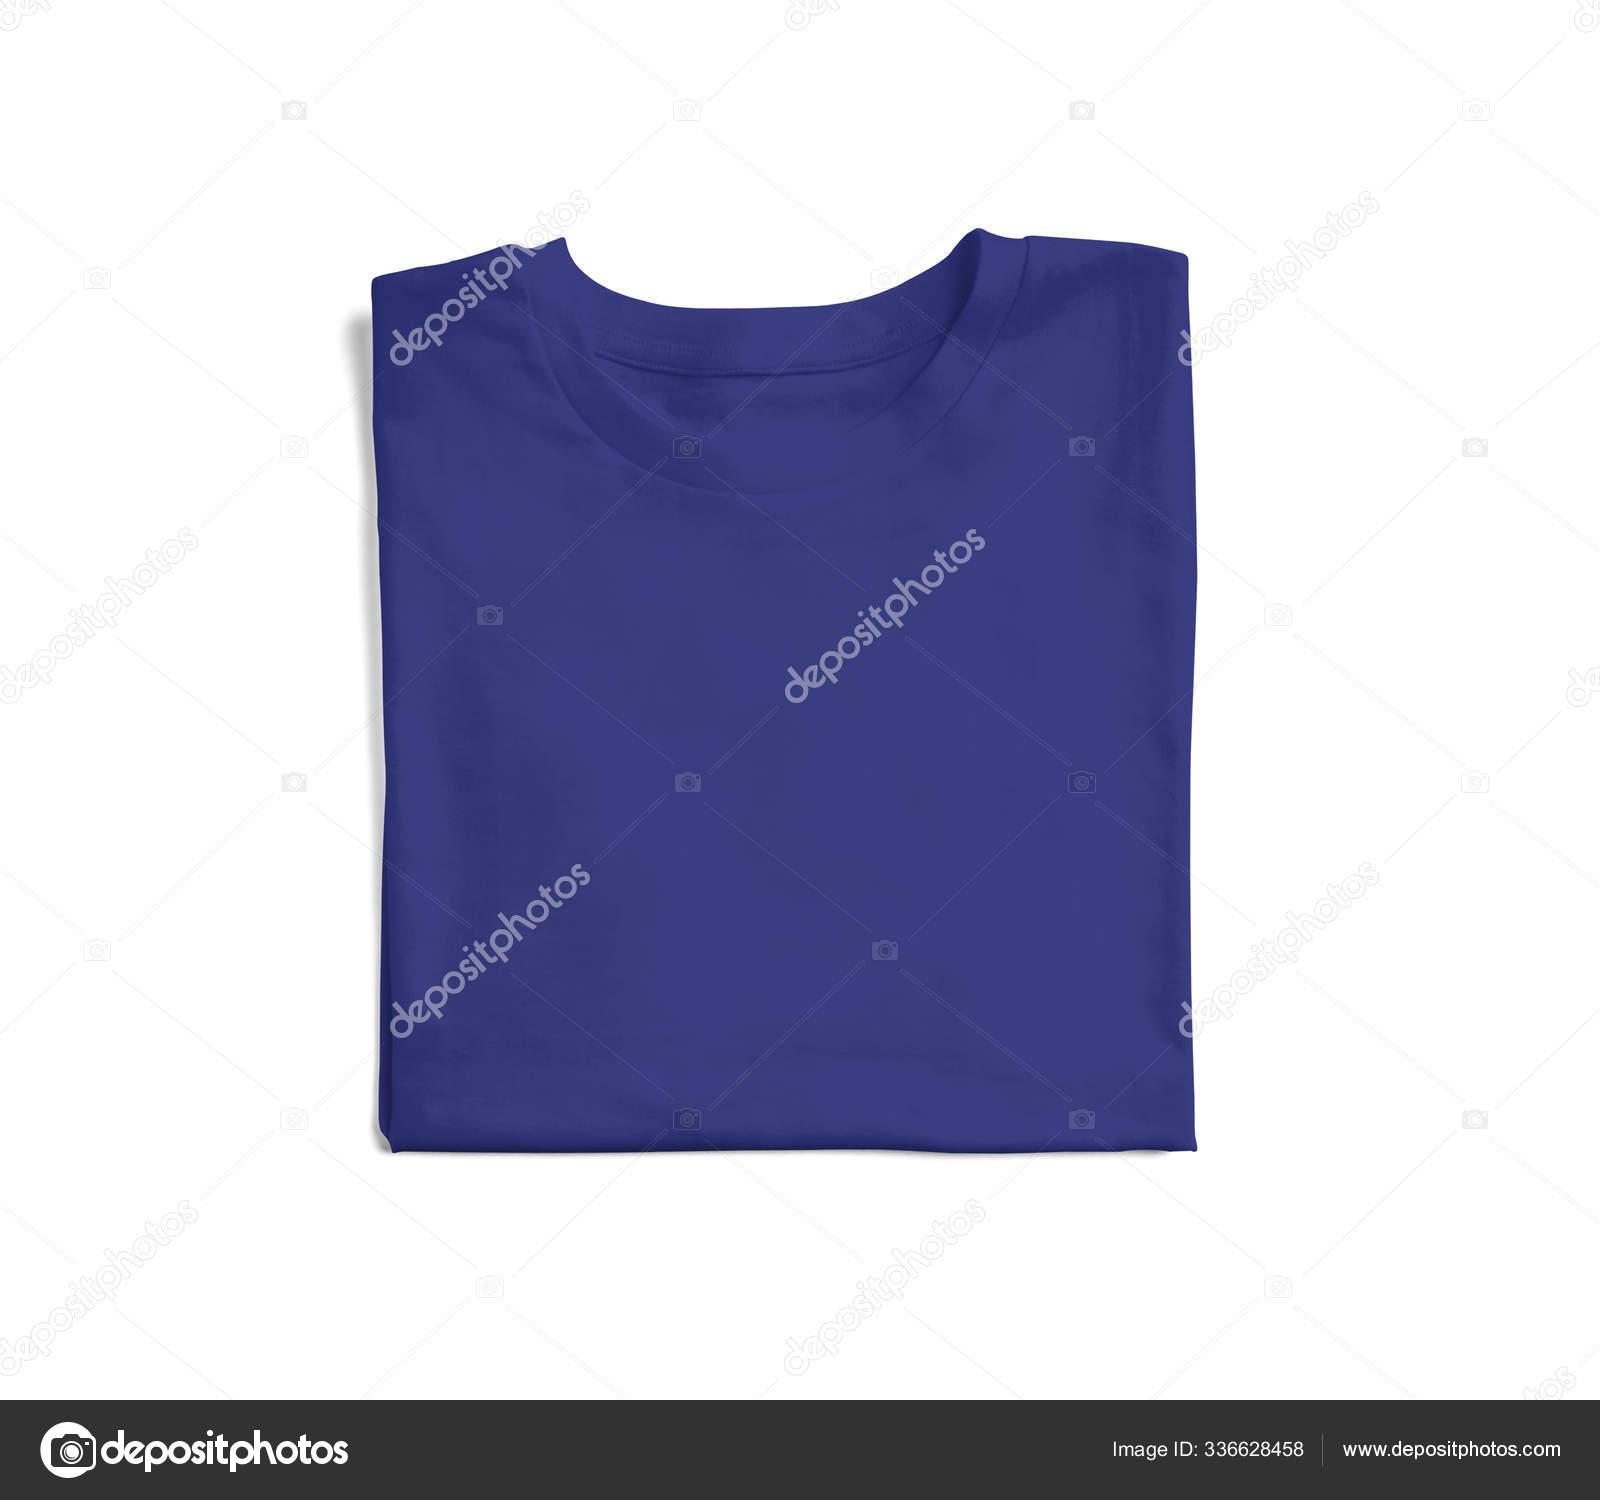 Folded Tshirt Mockup Royal Blue Color Made Make Your Logo Stock